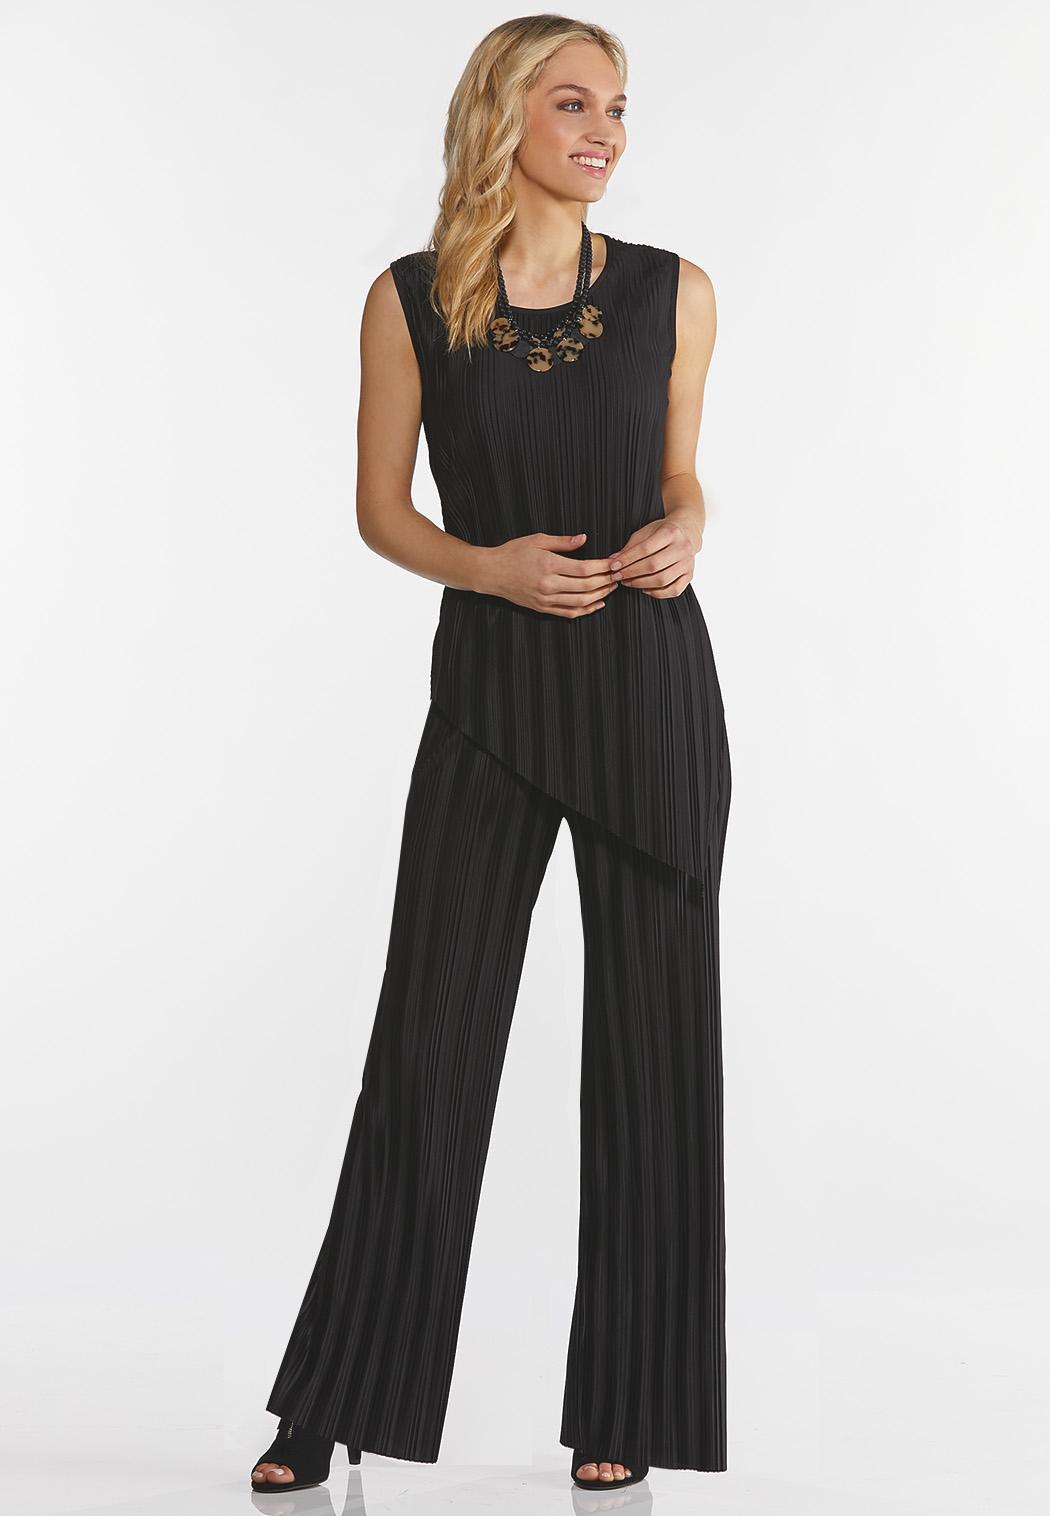 Plus Size Black Pleated Pant Set